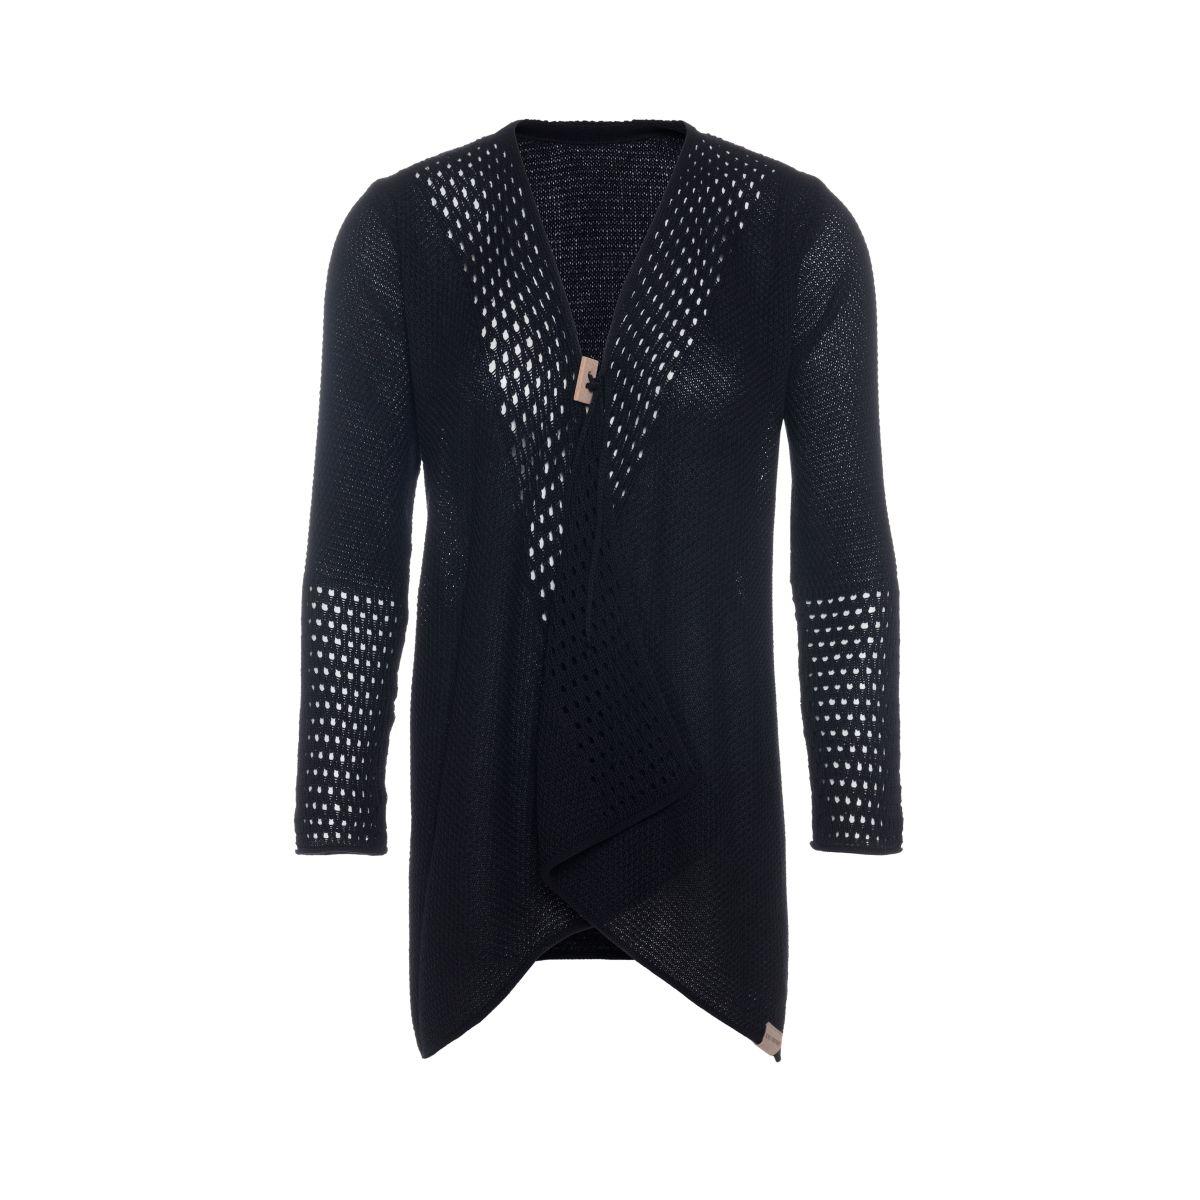 april knitted cardigan black 3638